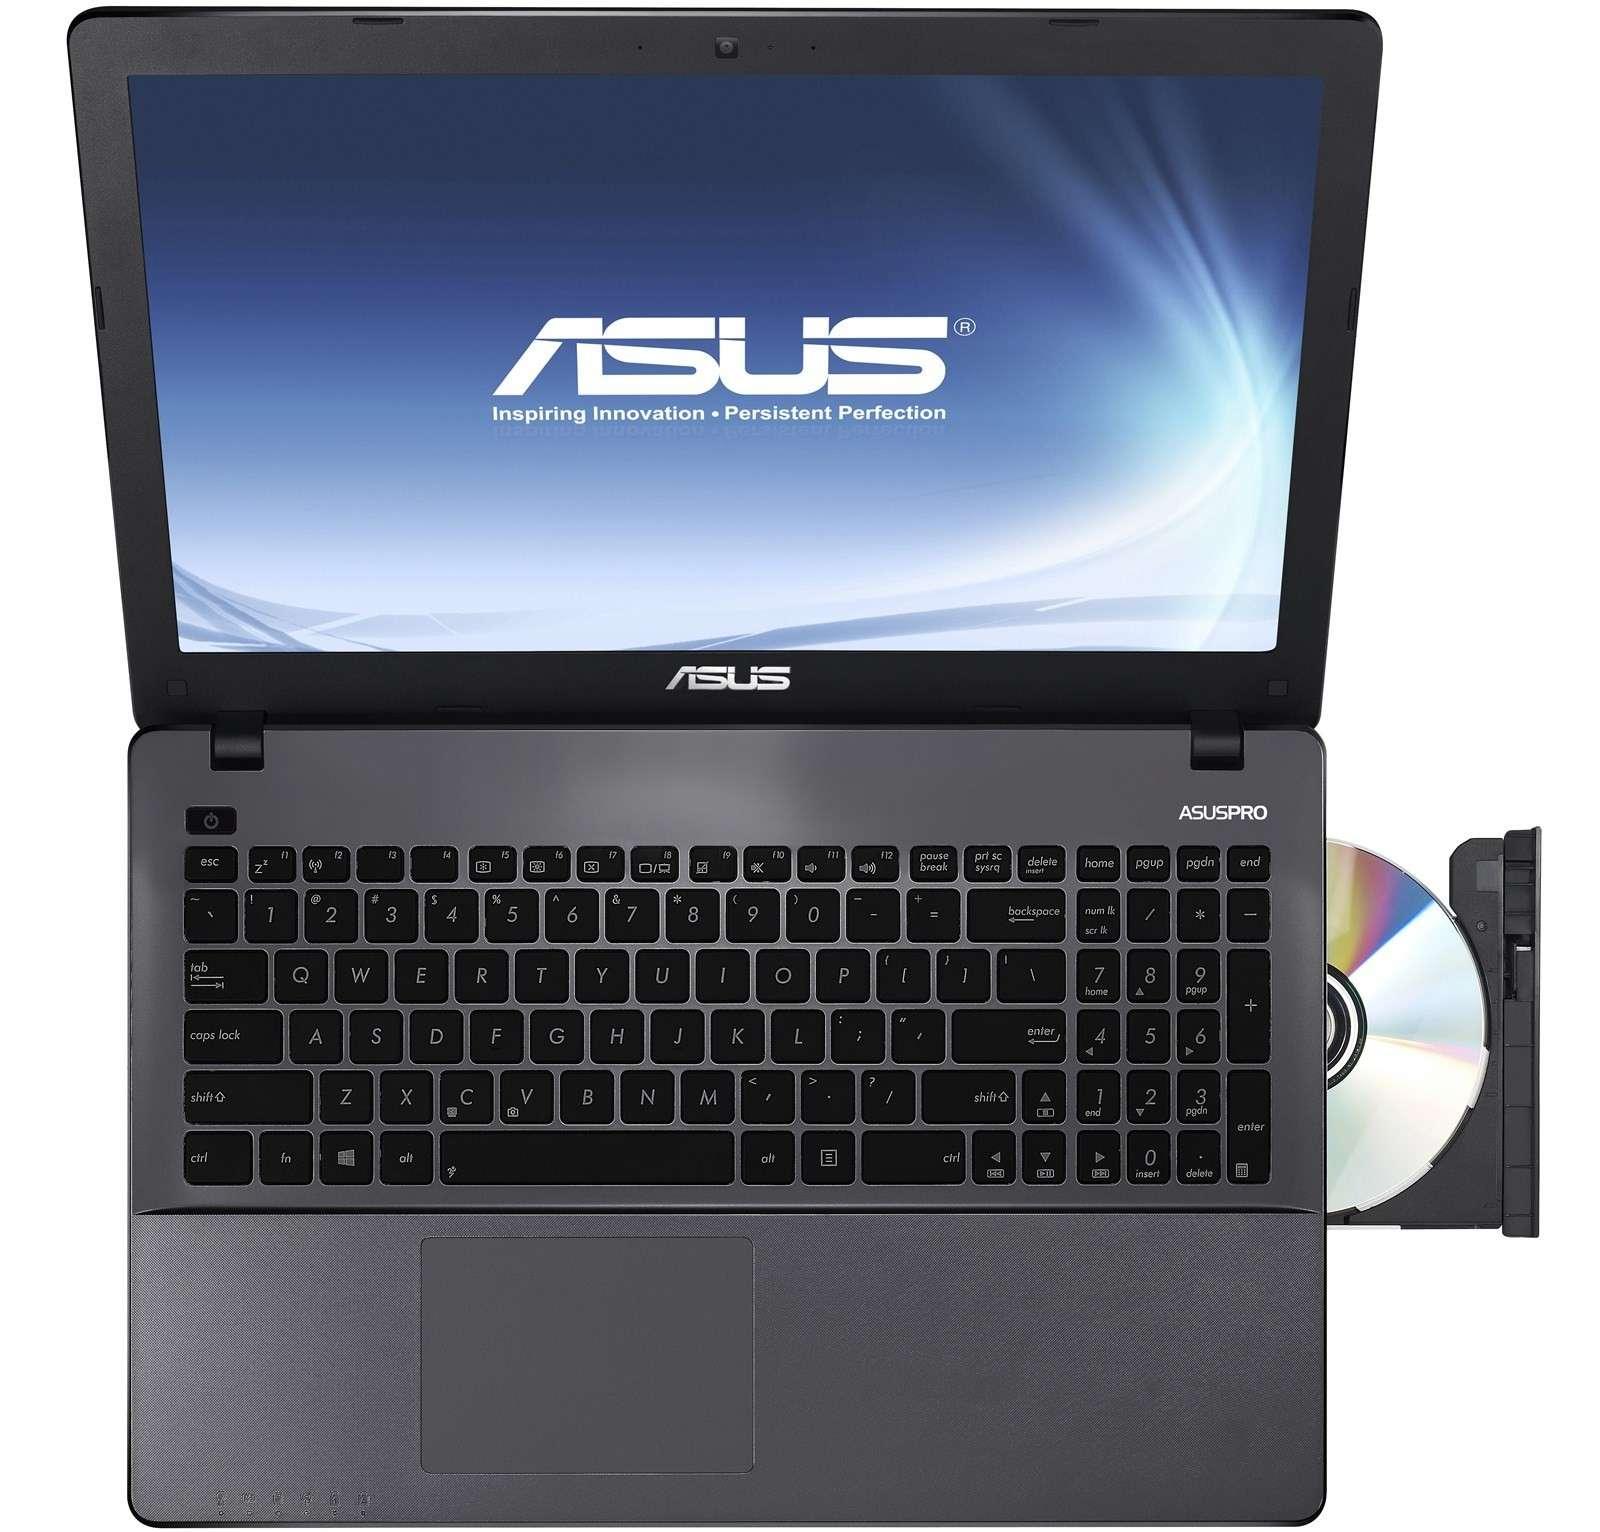 [BAN TRA GOP] Laptop ASUS Core i5 thế hệ 4 mới nhất 480_2_10